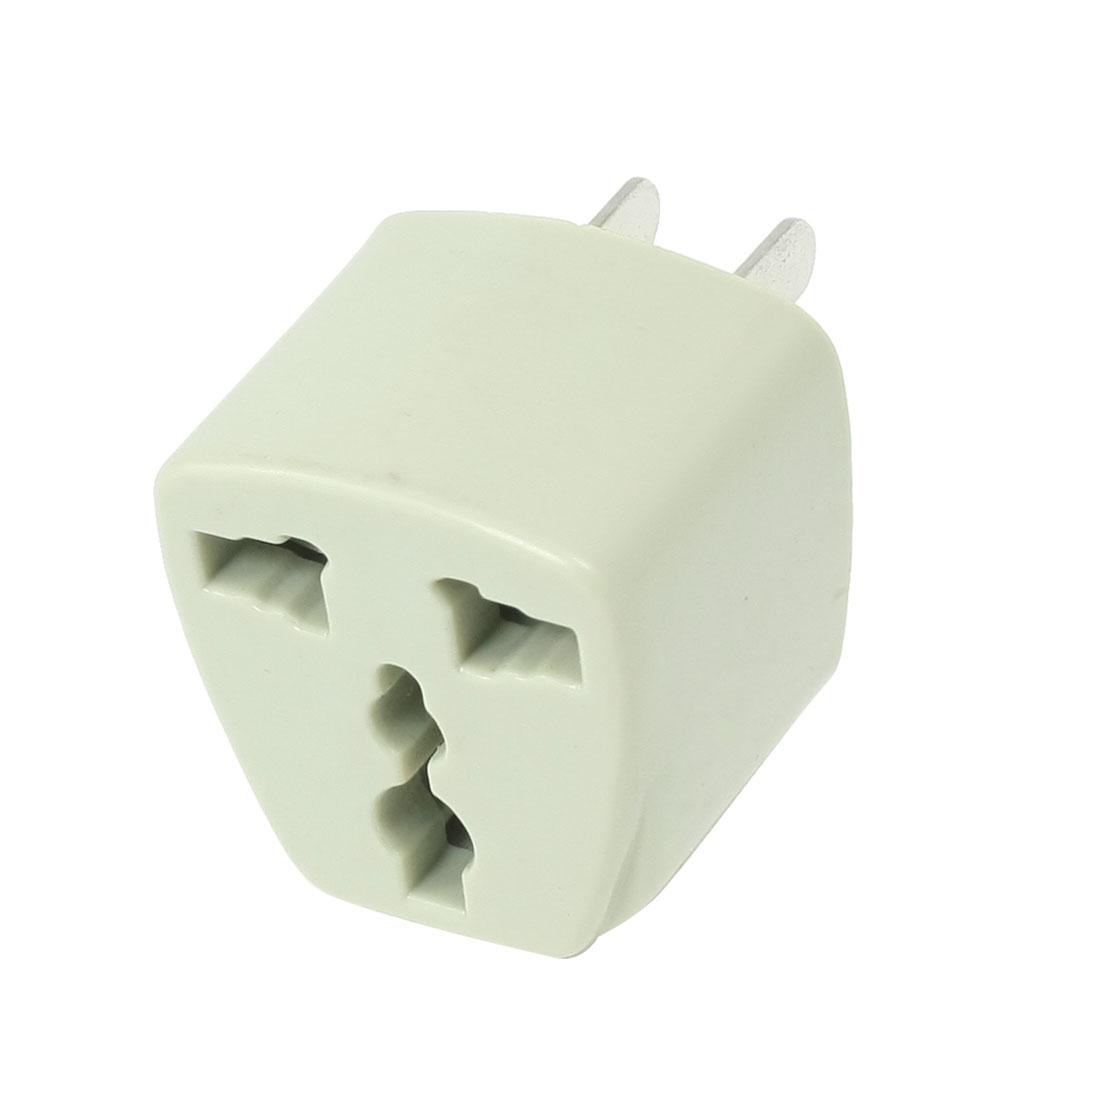 10A 250VAC AU/EU/UK Socket to US 2 Pin Plug Travel Power Adapter